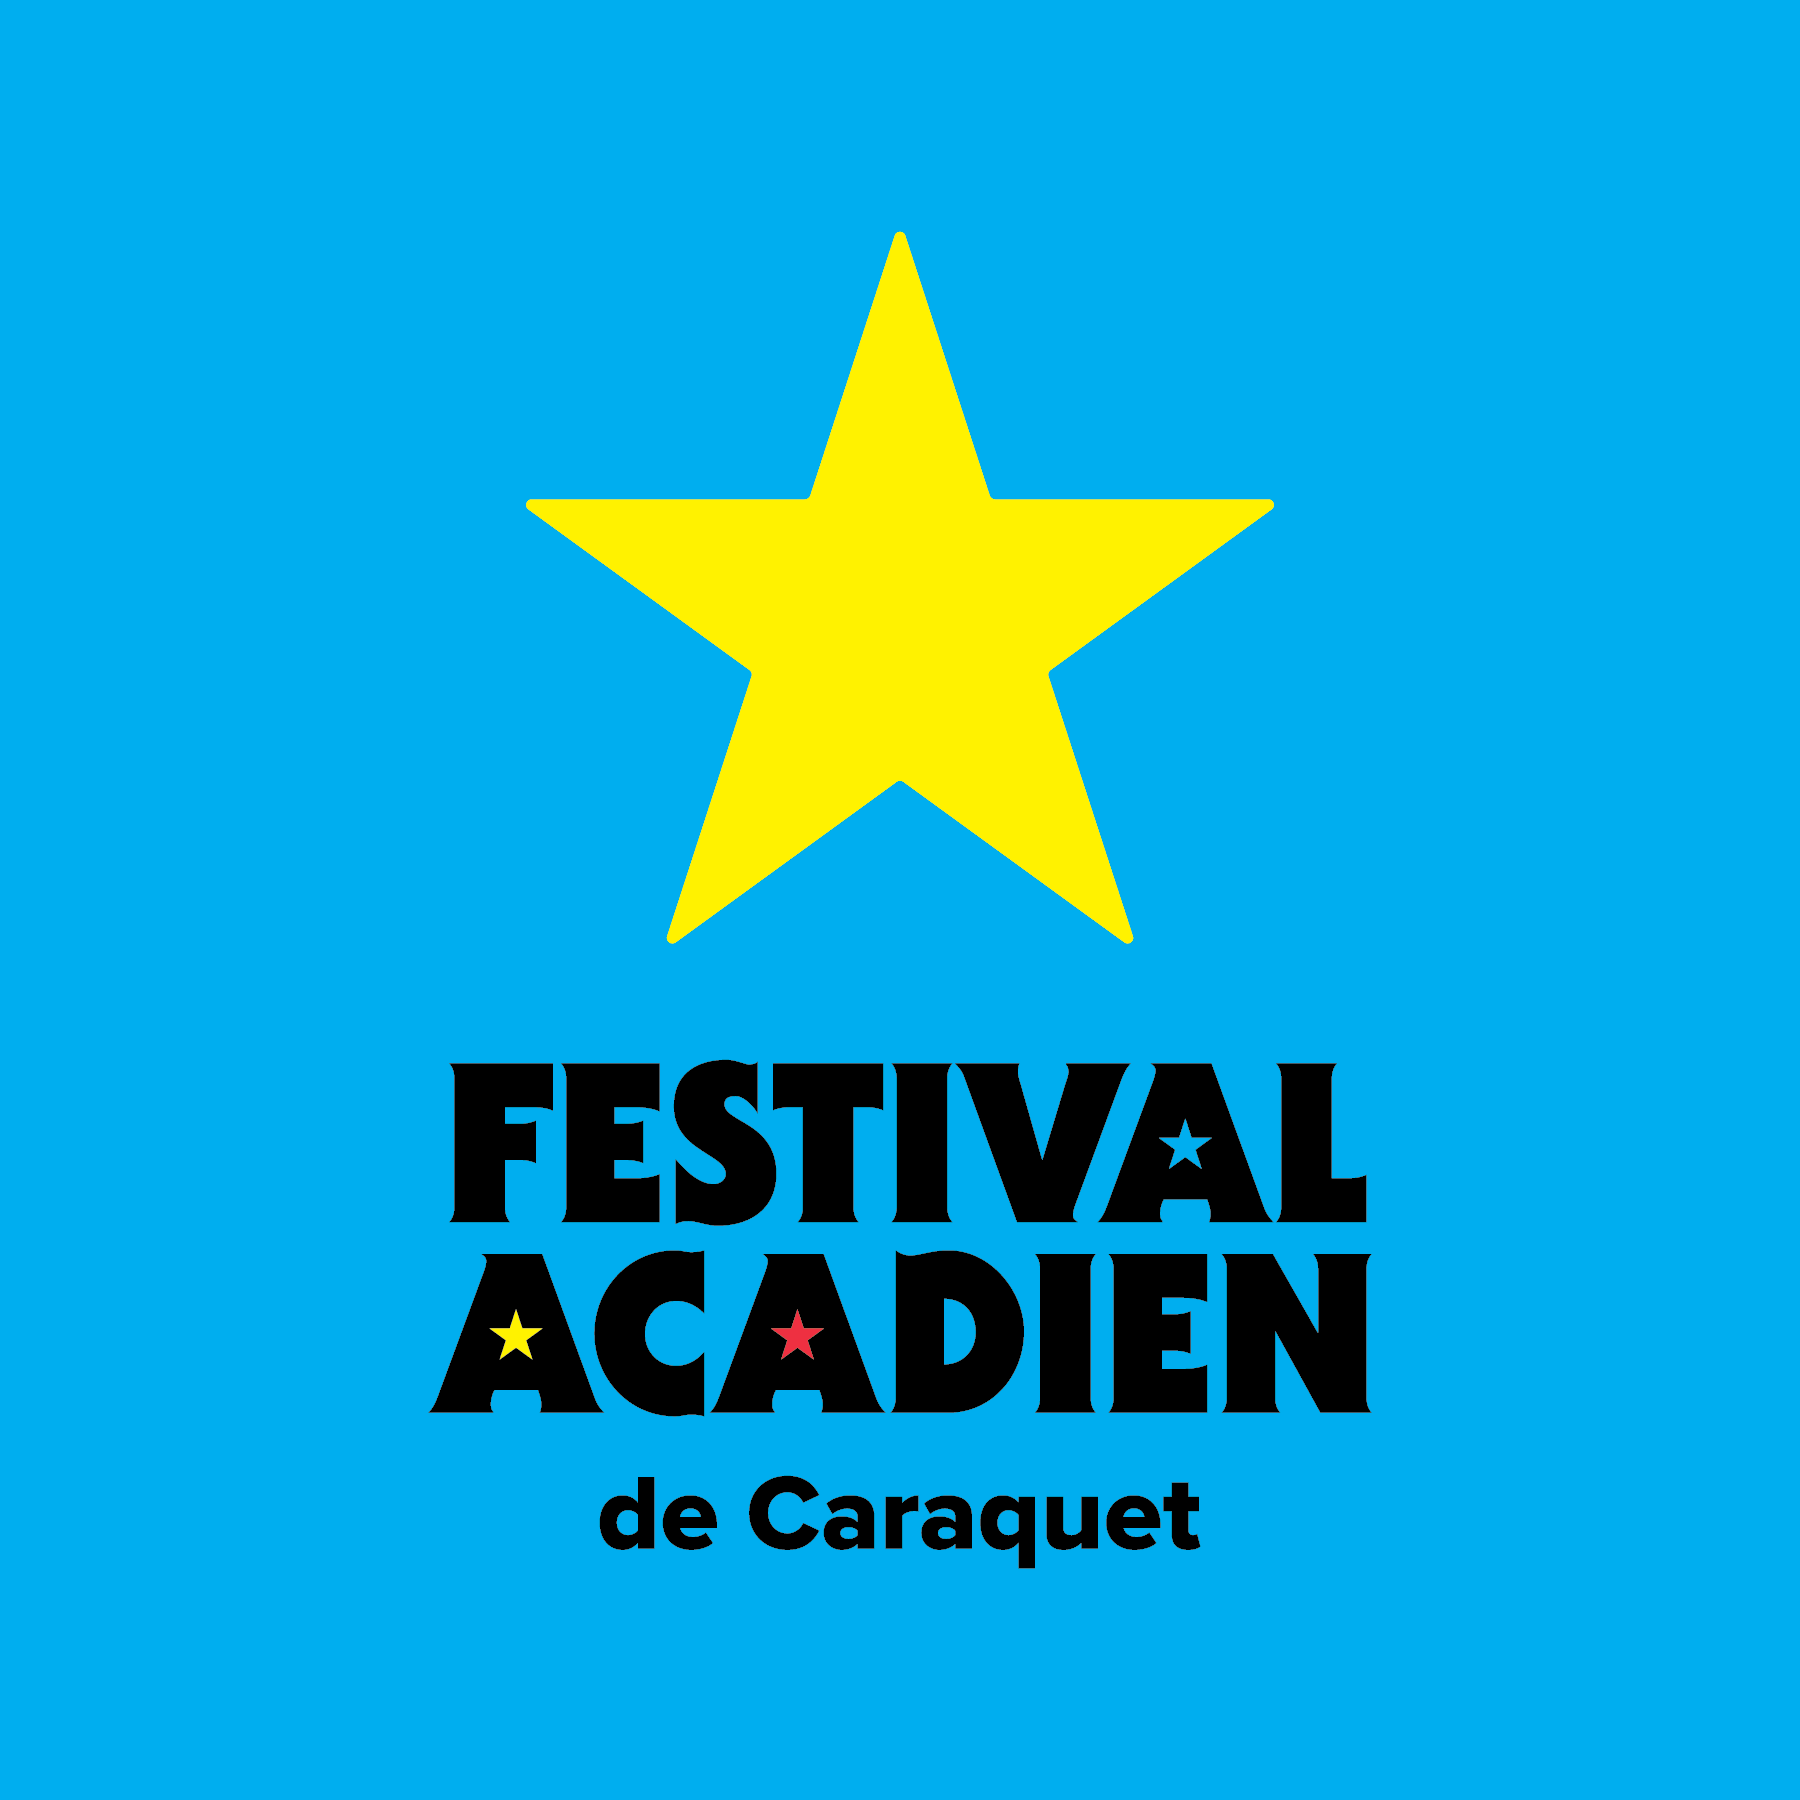 Logo-FestivalAcadien-cou-bleujaune.png